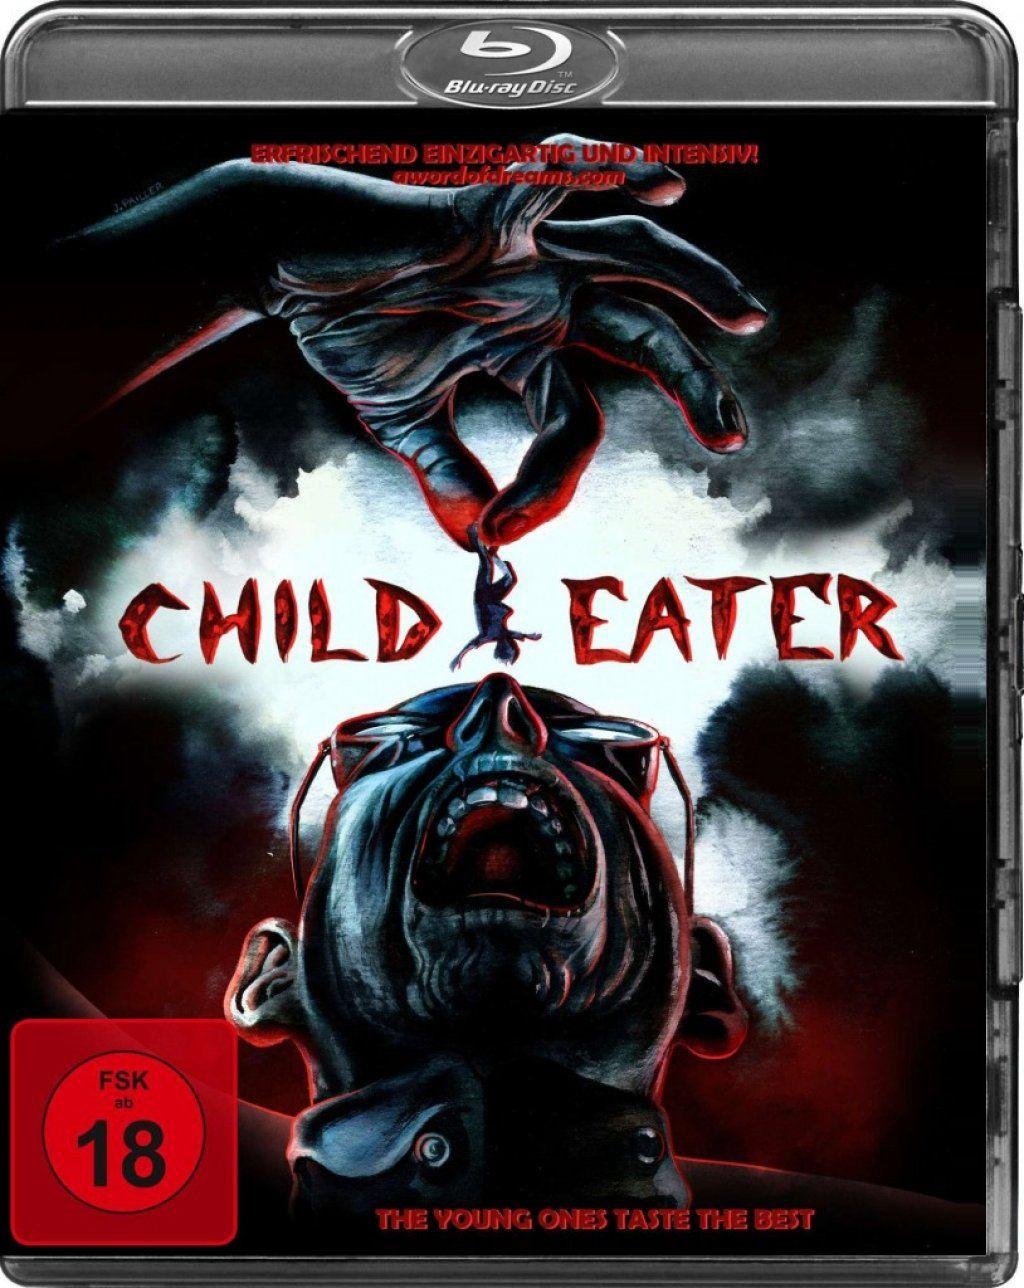 Child Eater (BLURAY)